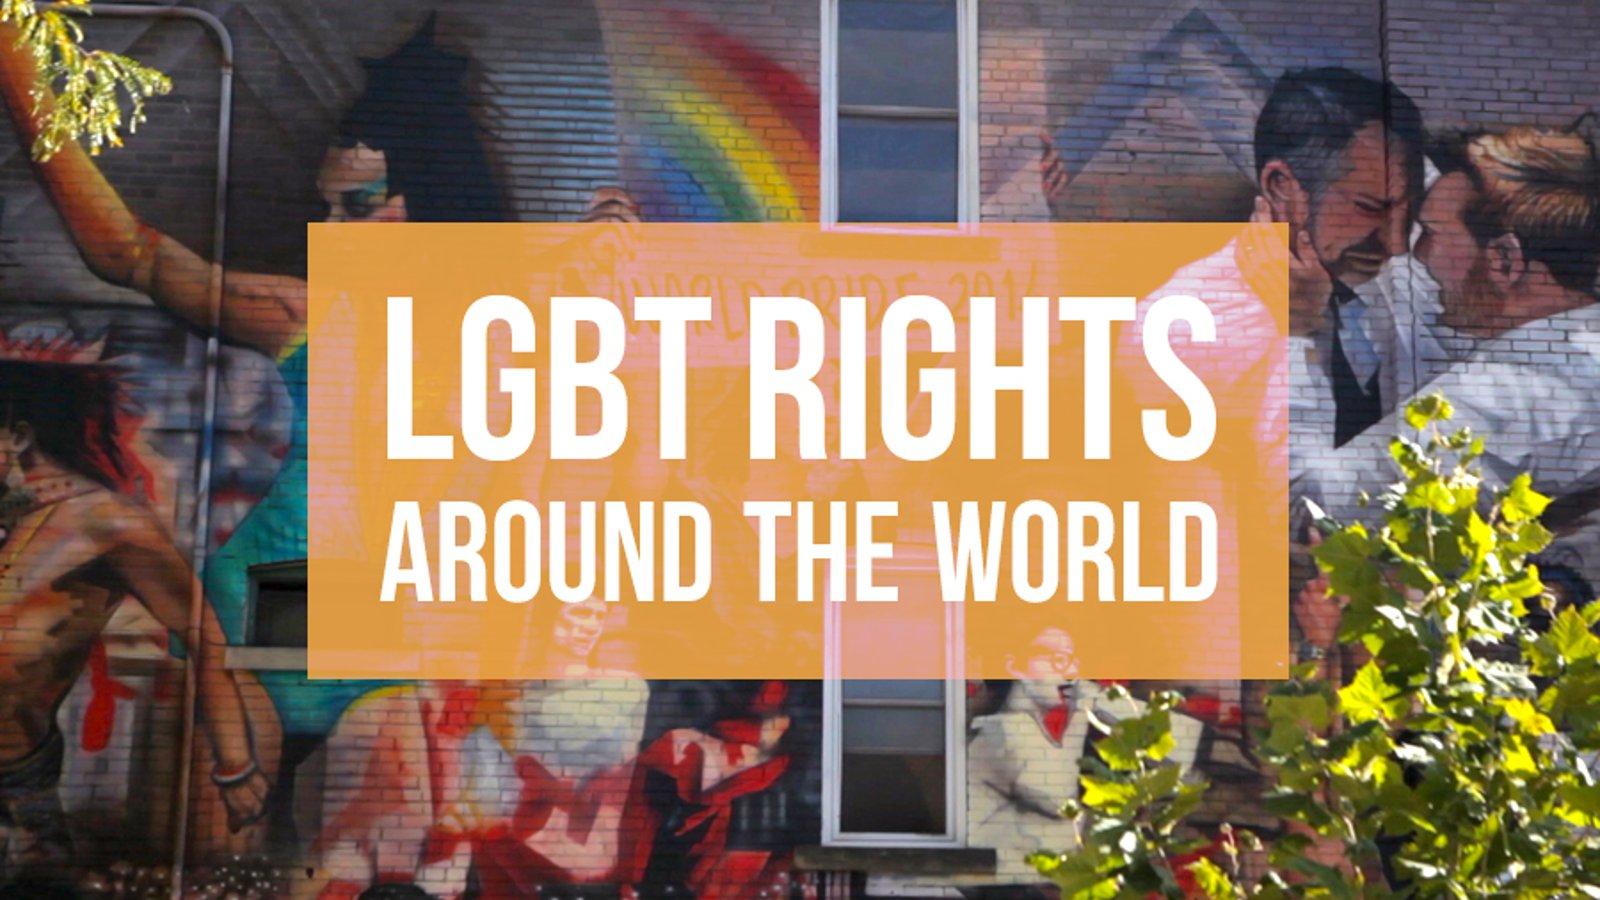 LGBT Rights Around the World